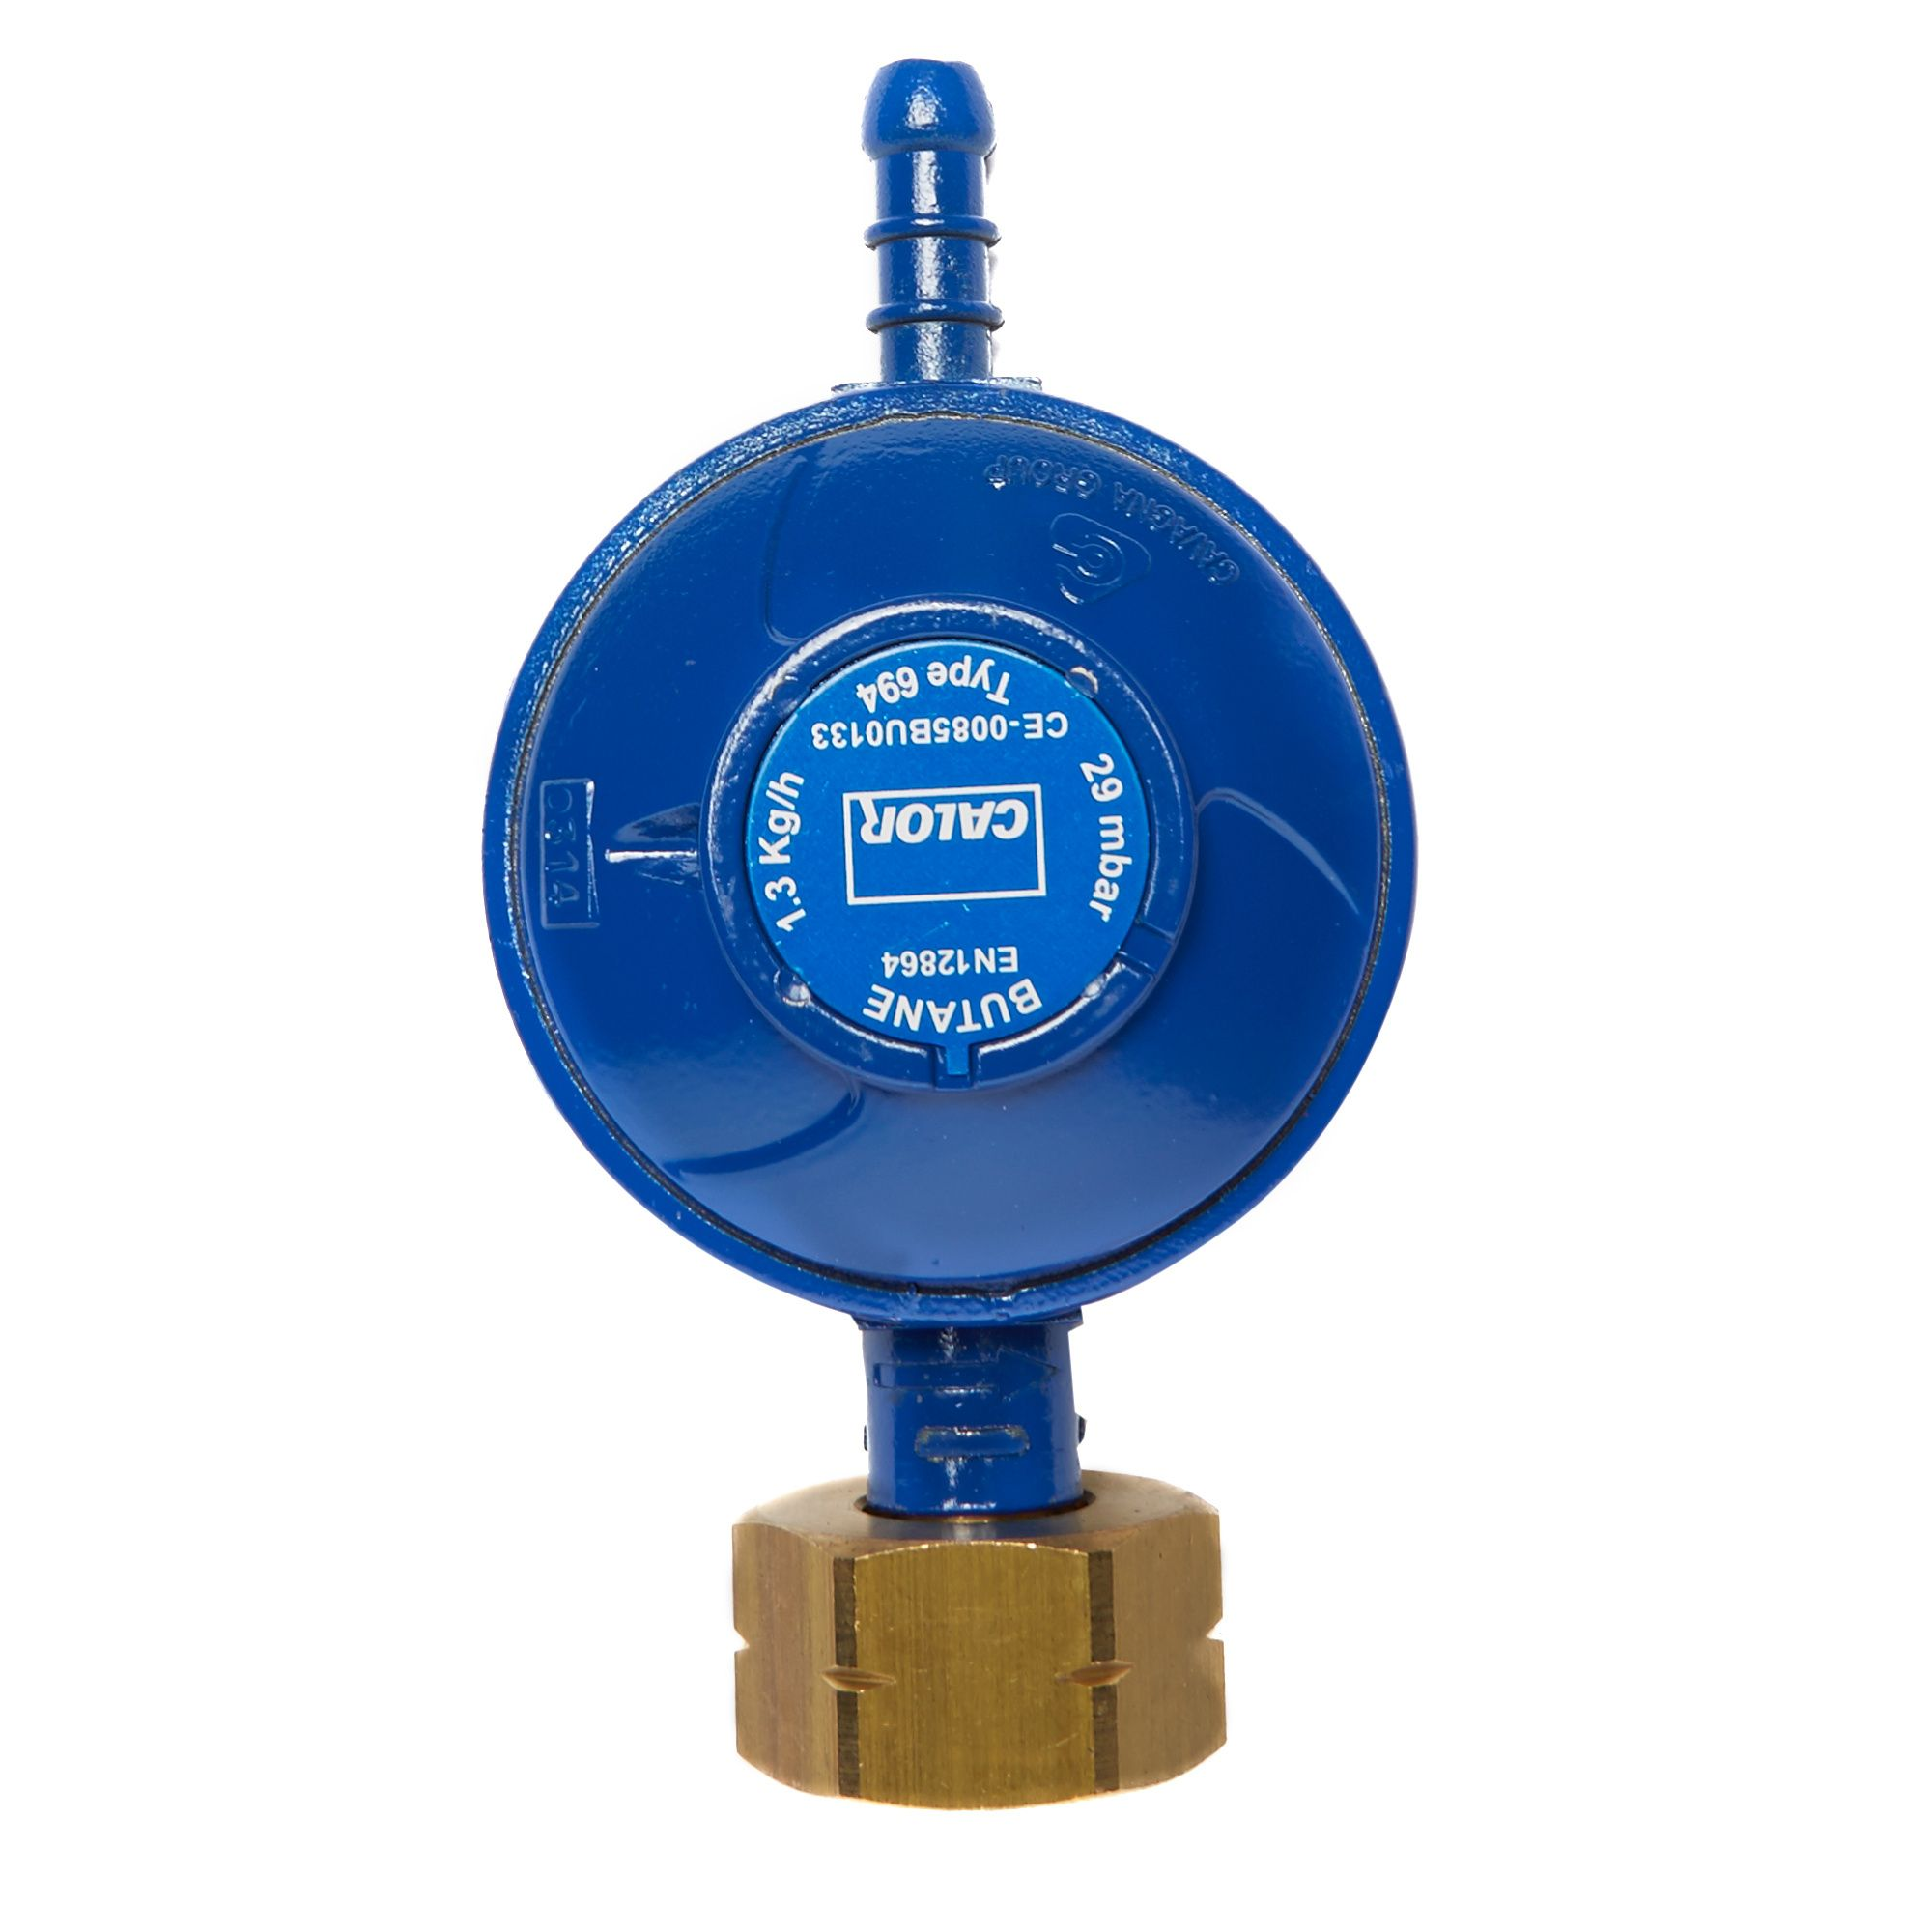 CALOR GAS 29mbar Butane Regulator